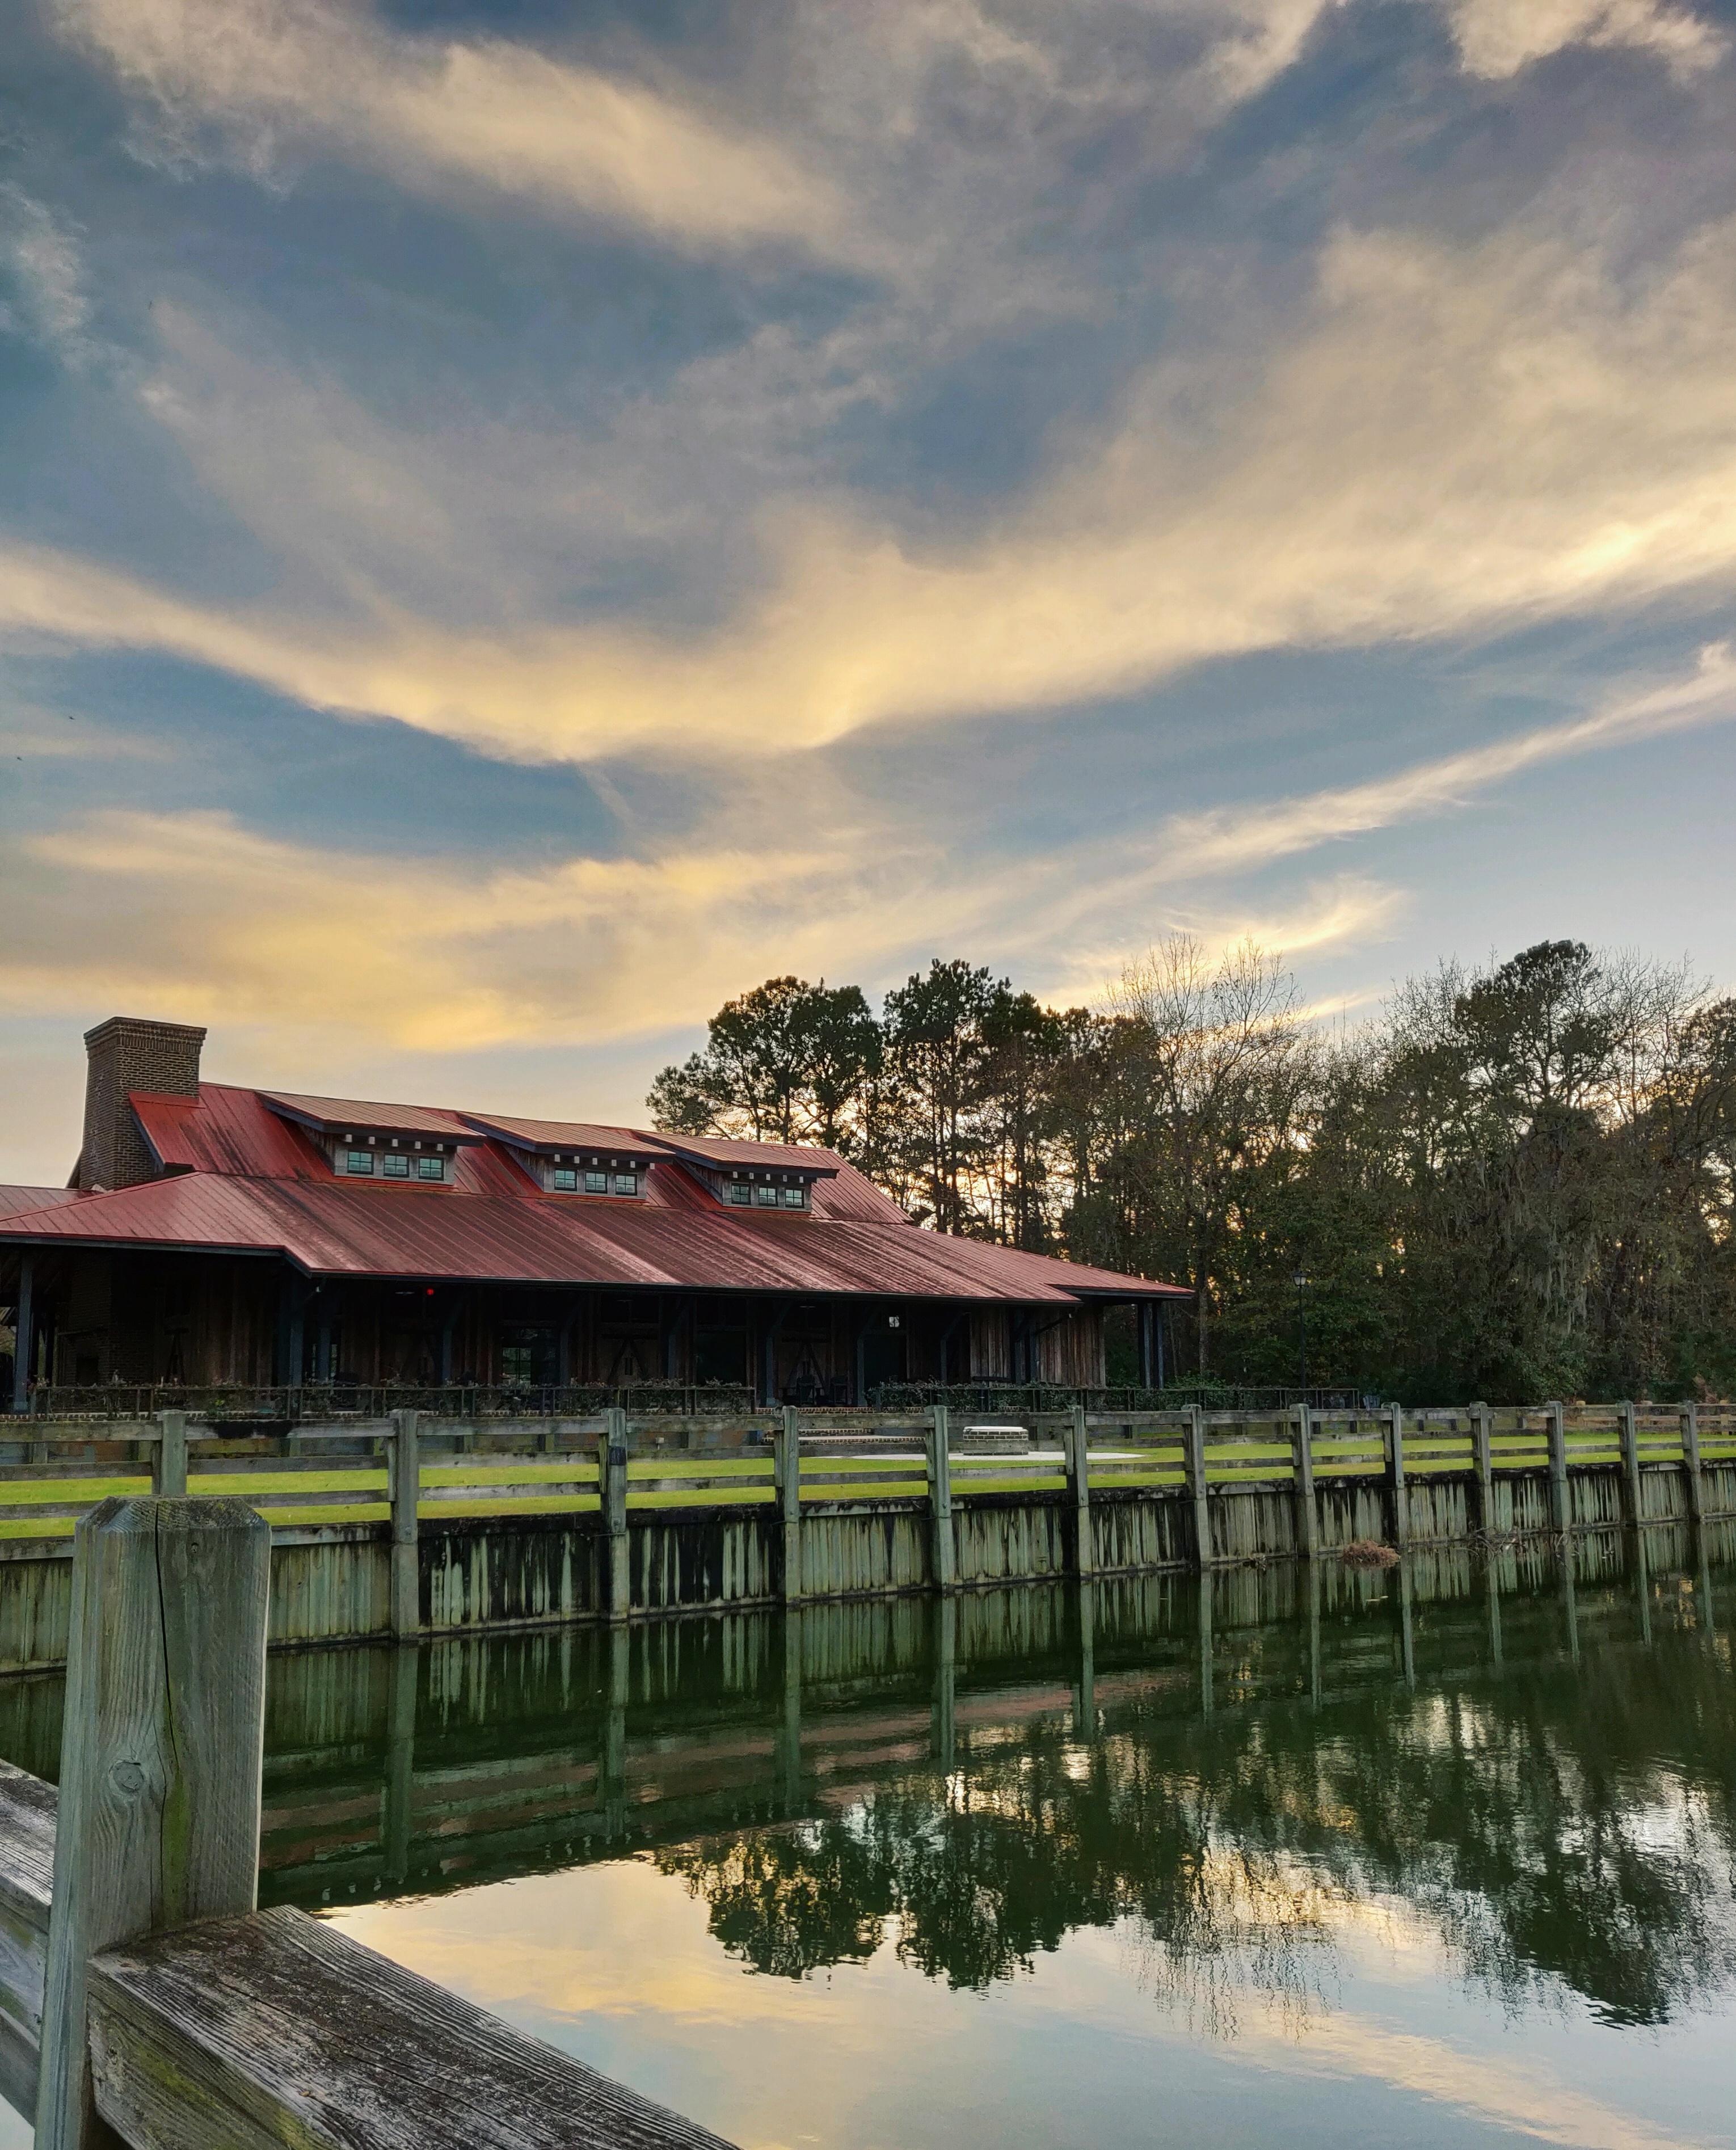 The Pavilion at Pepper Plantation